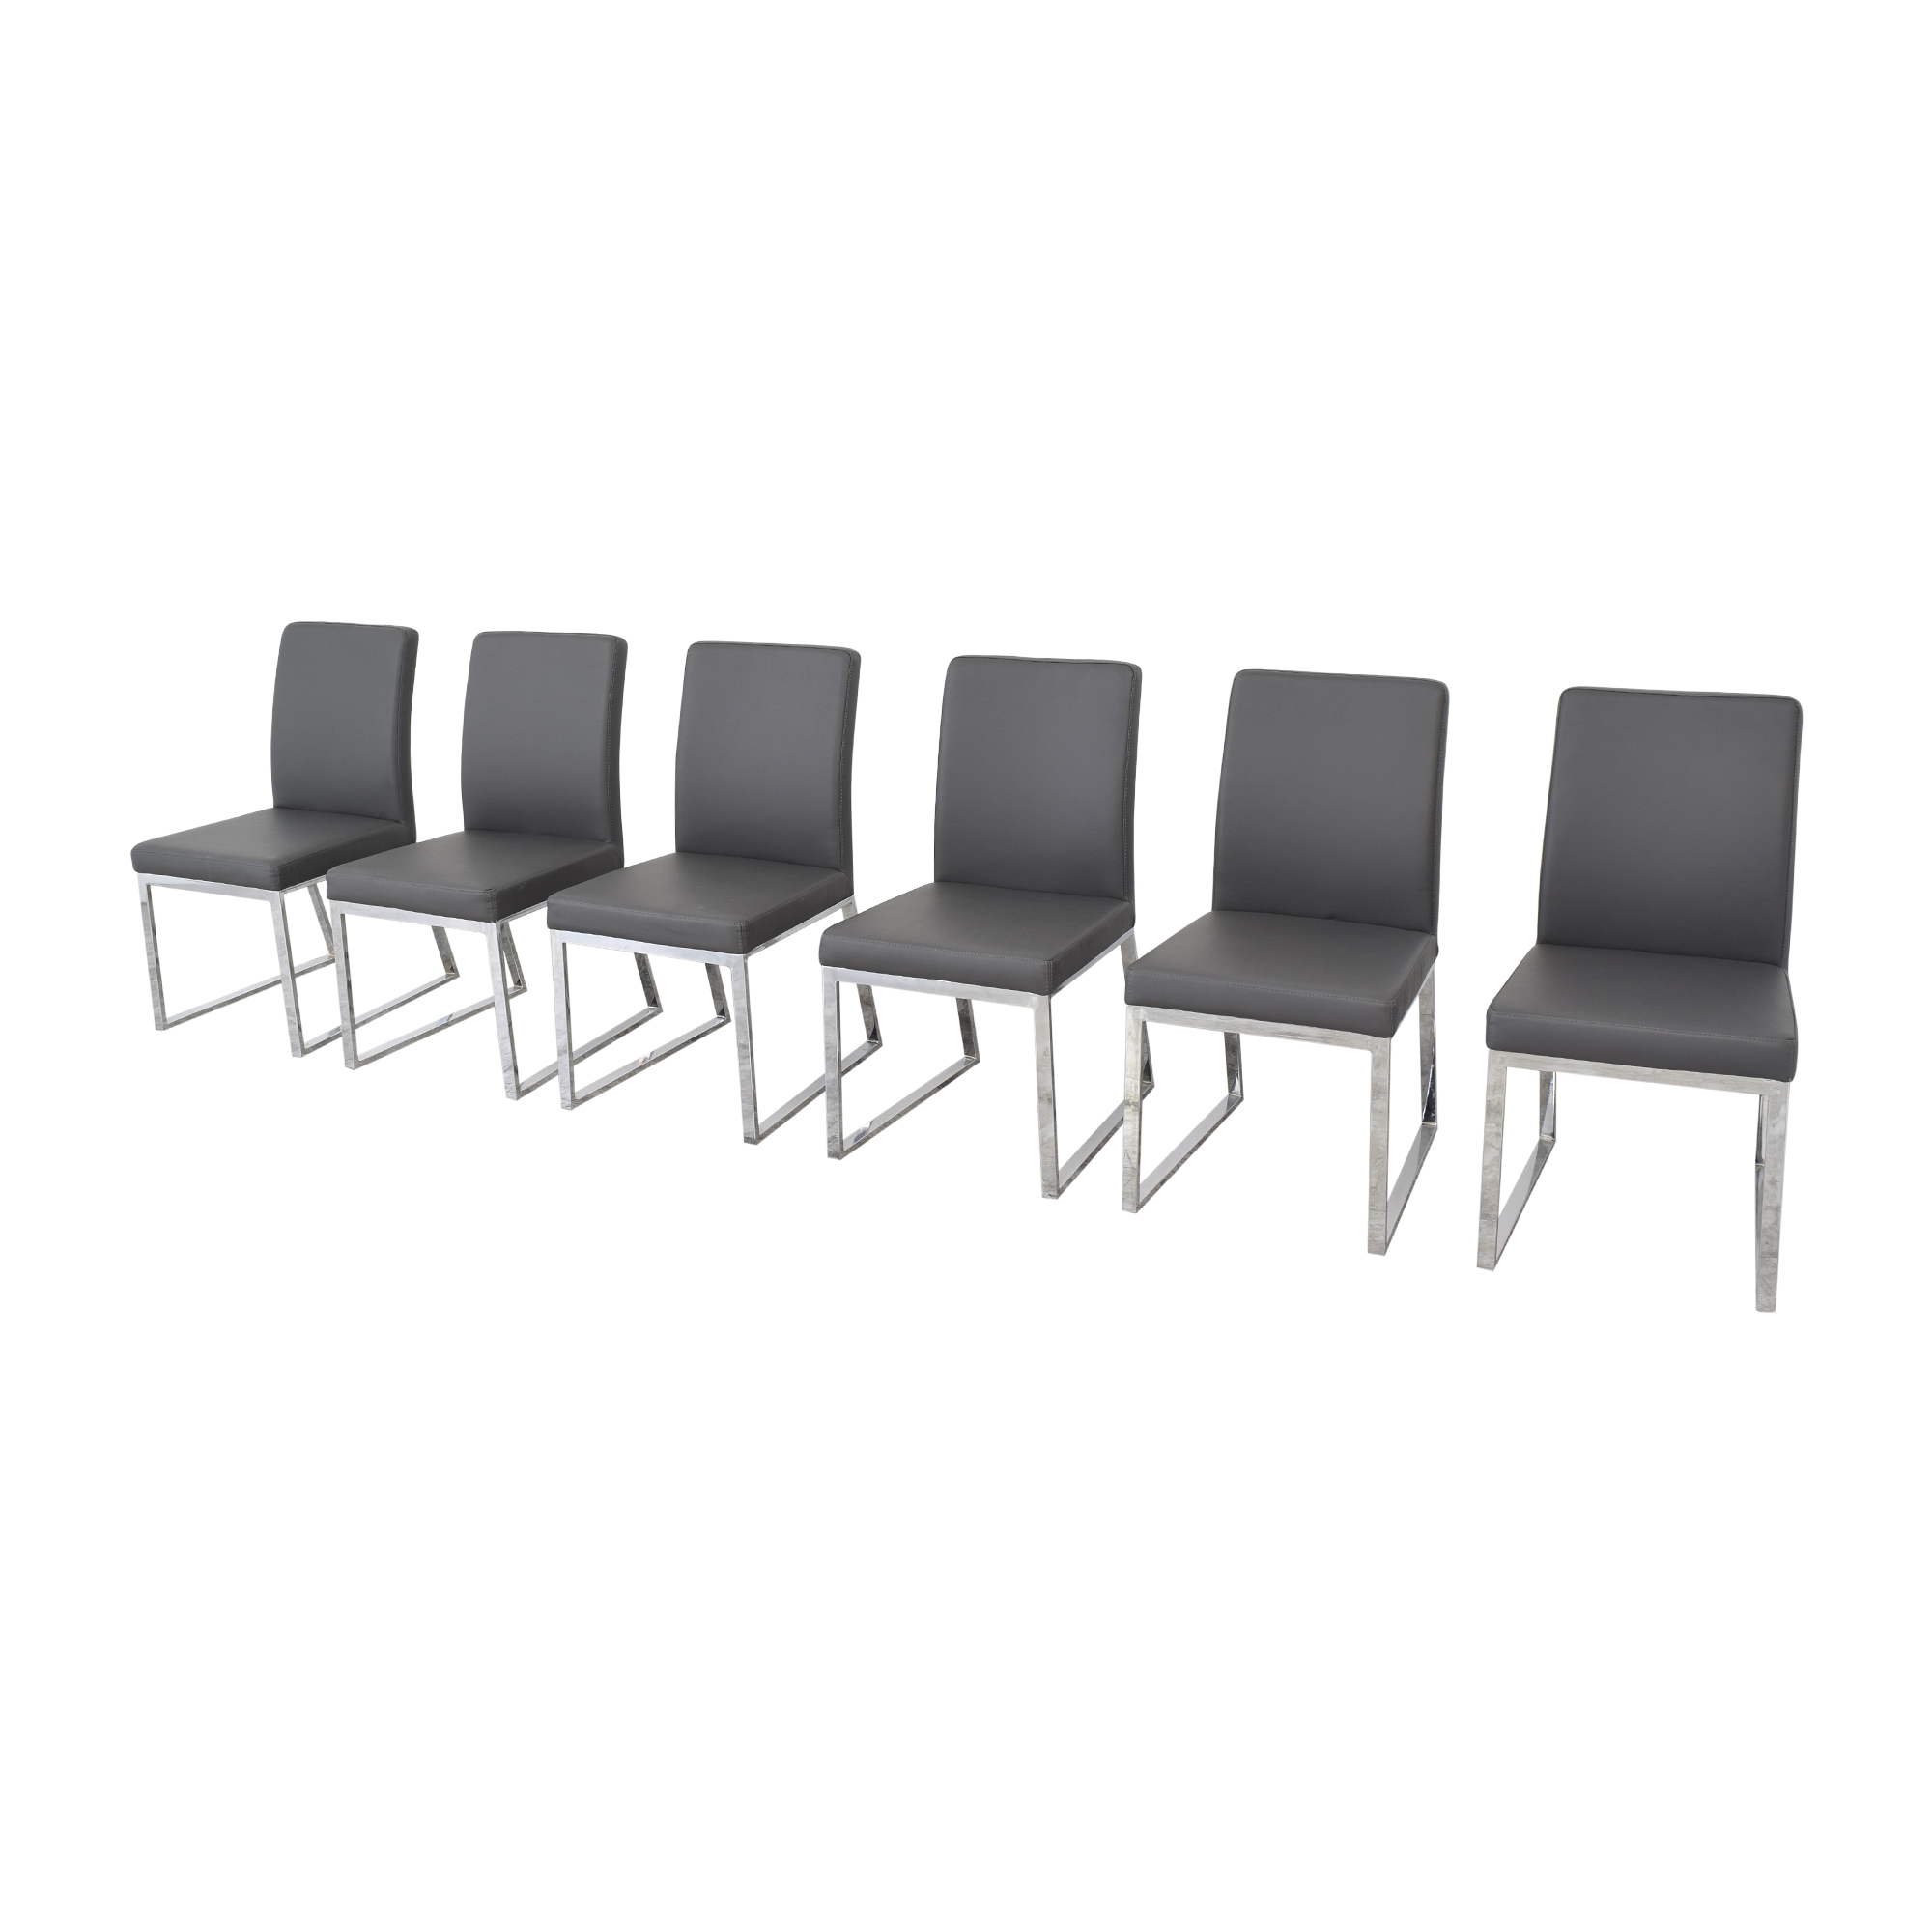 Modani Modani Niero Dining Chairs second hand